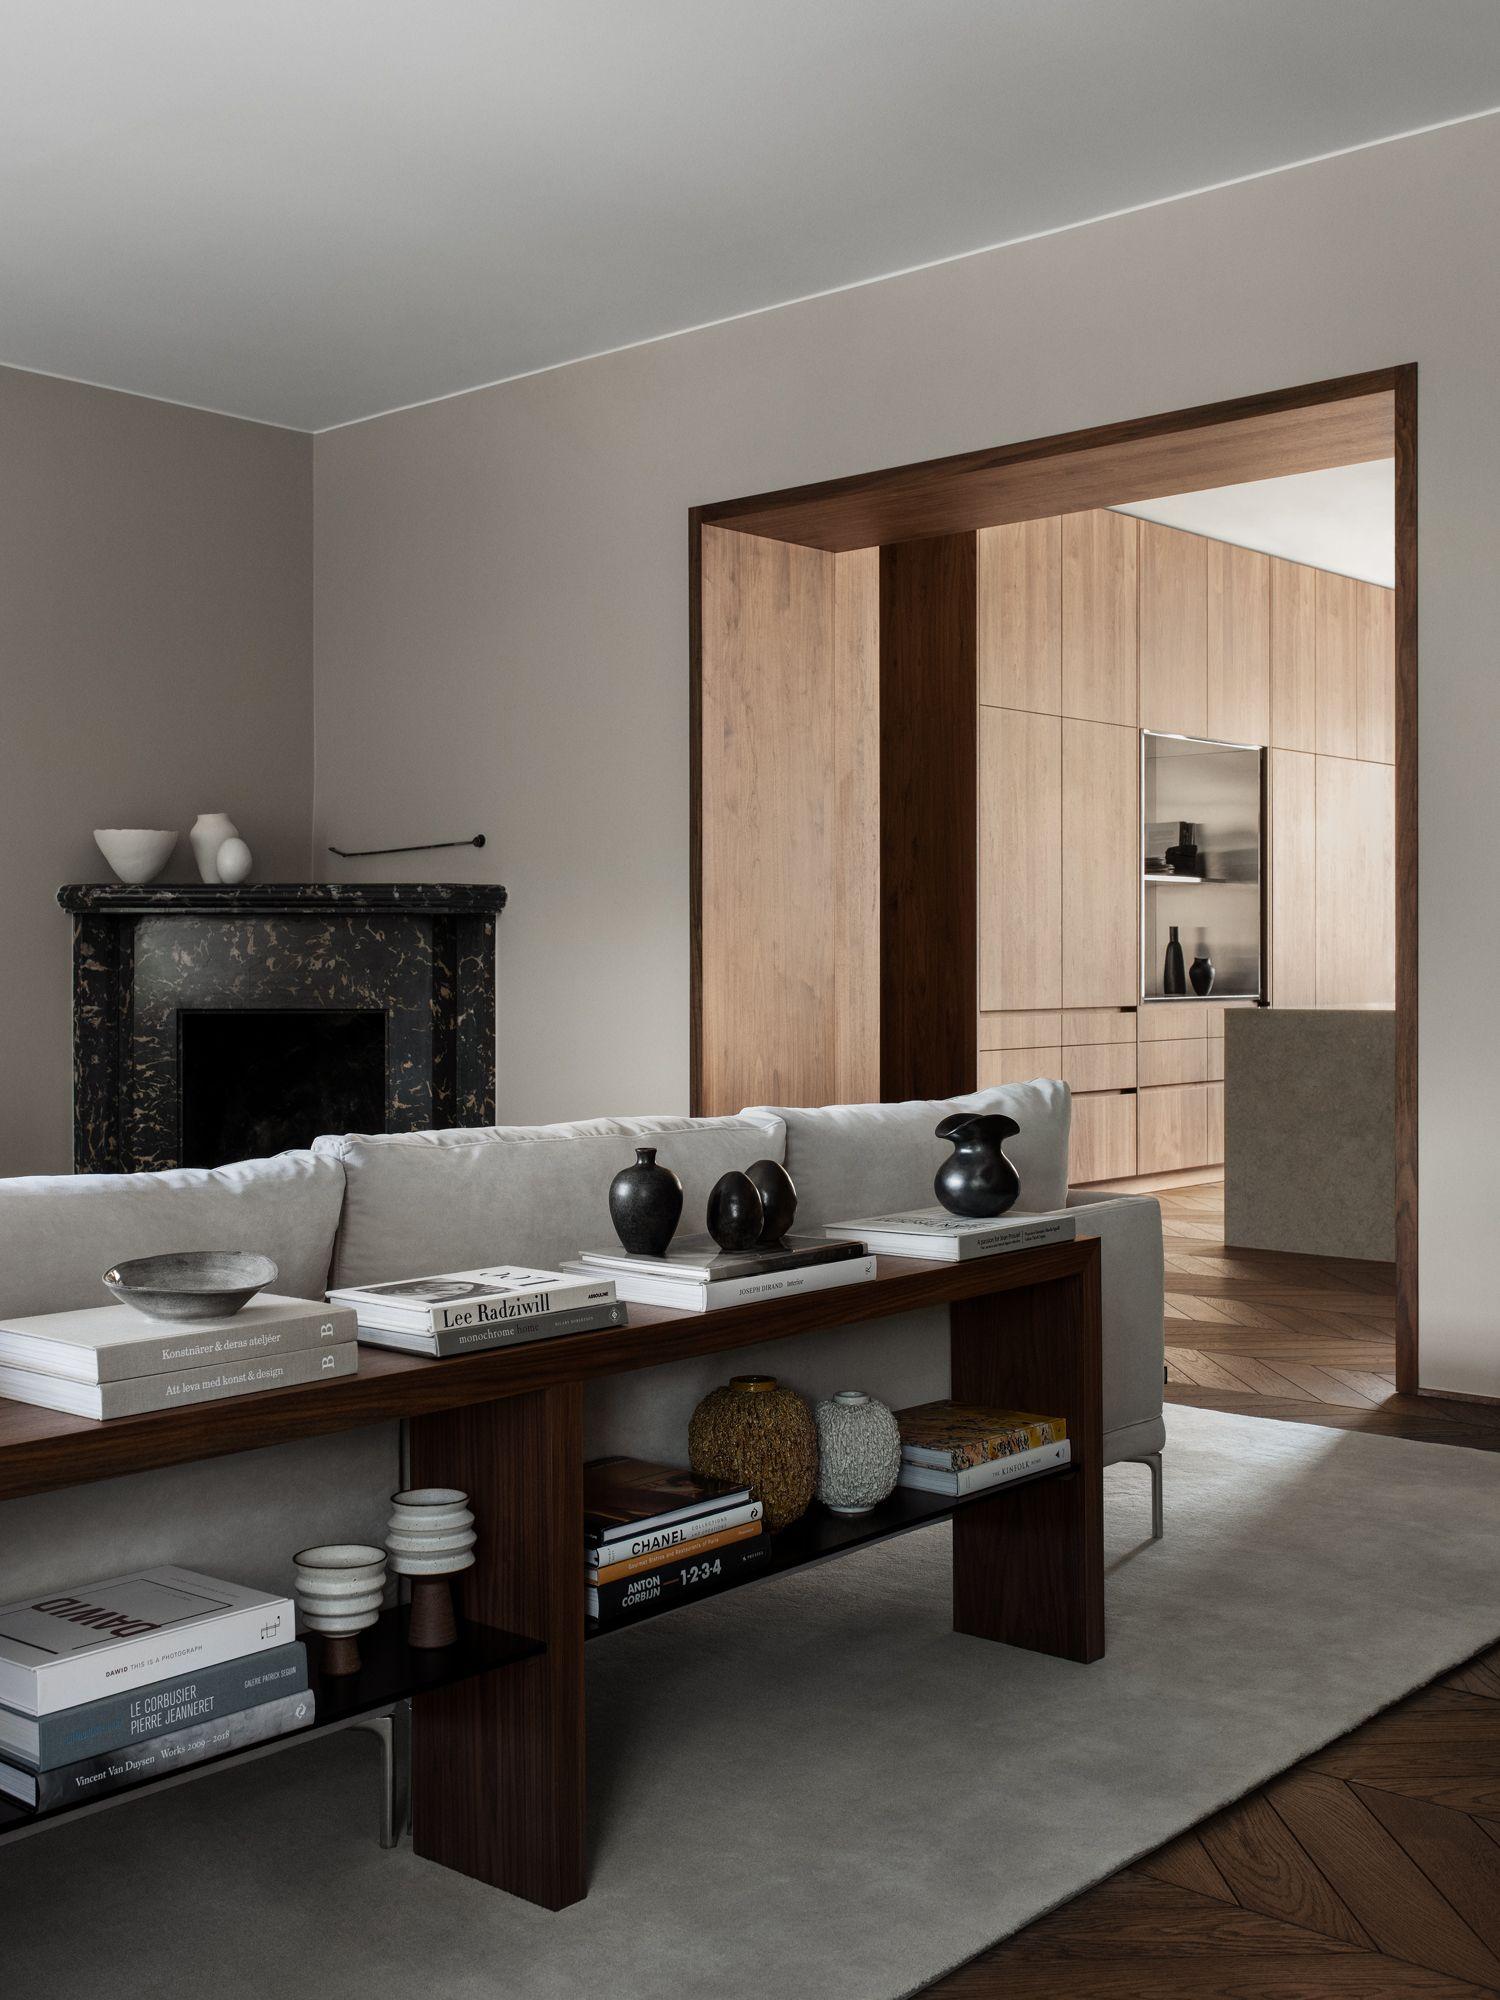 Photo of Strandvägen Home by Liljencrantz Design | est living